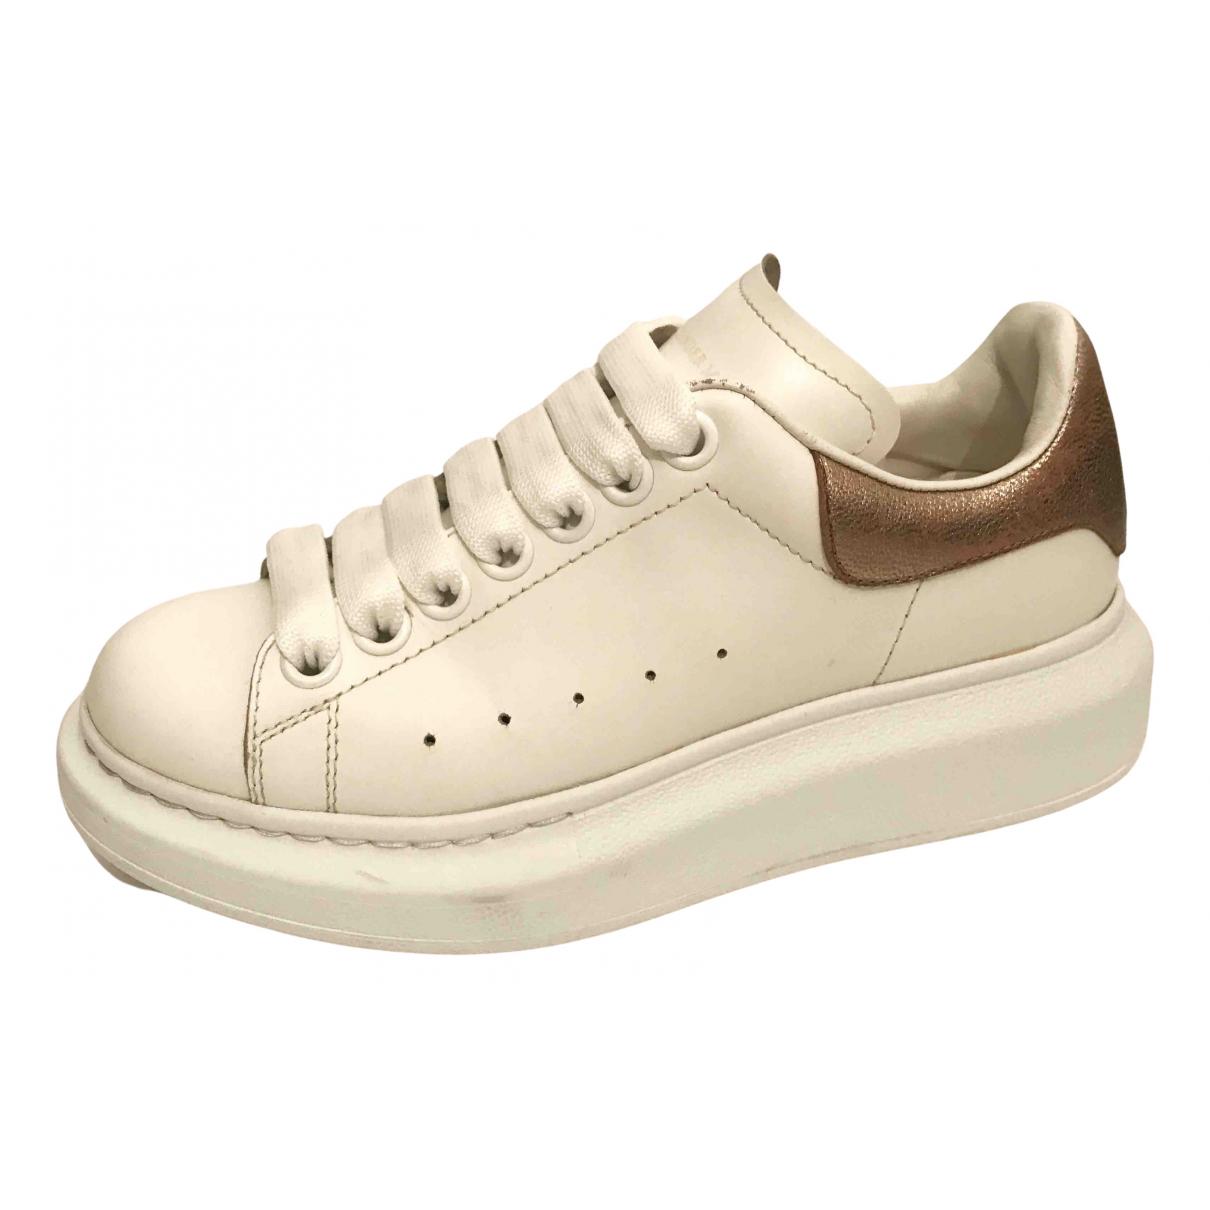 Alexander Mcqueen - Baskets Oversize pour femme en cuir - blanc